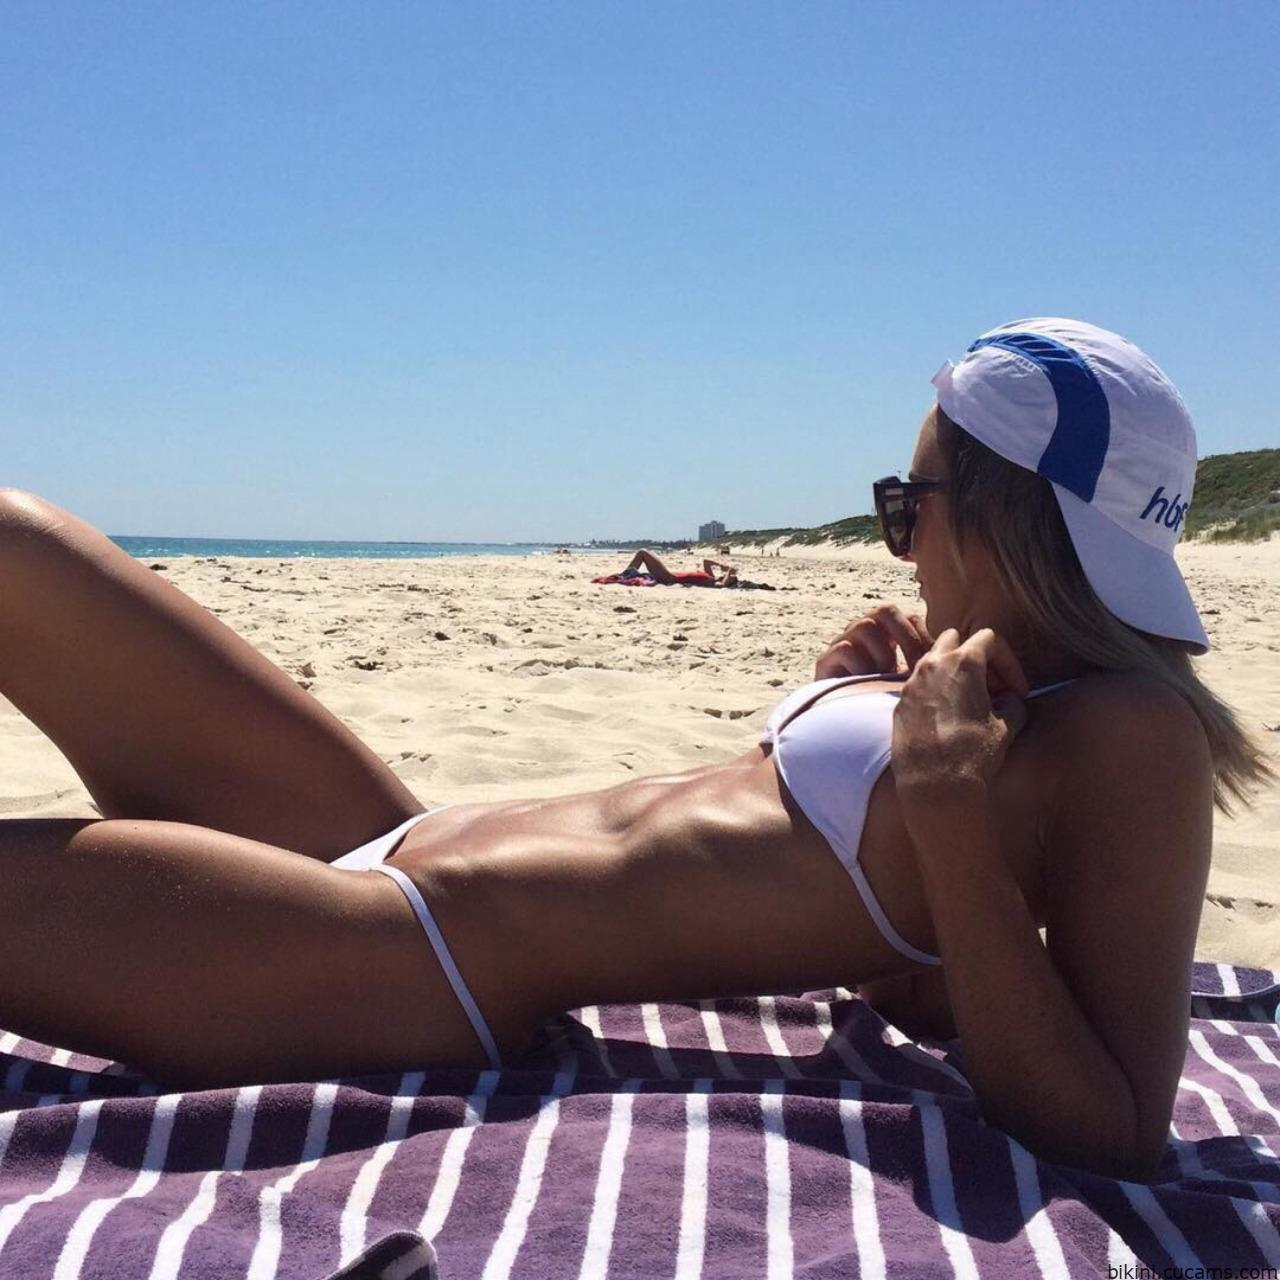 Bikini Girl Ejaculation by bikini.cucams.com